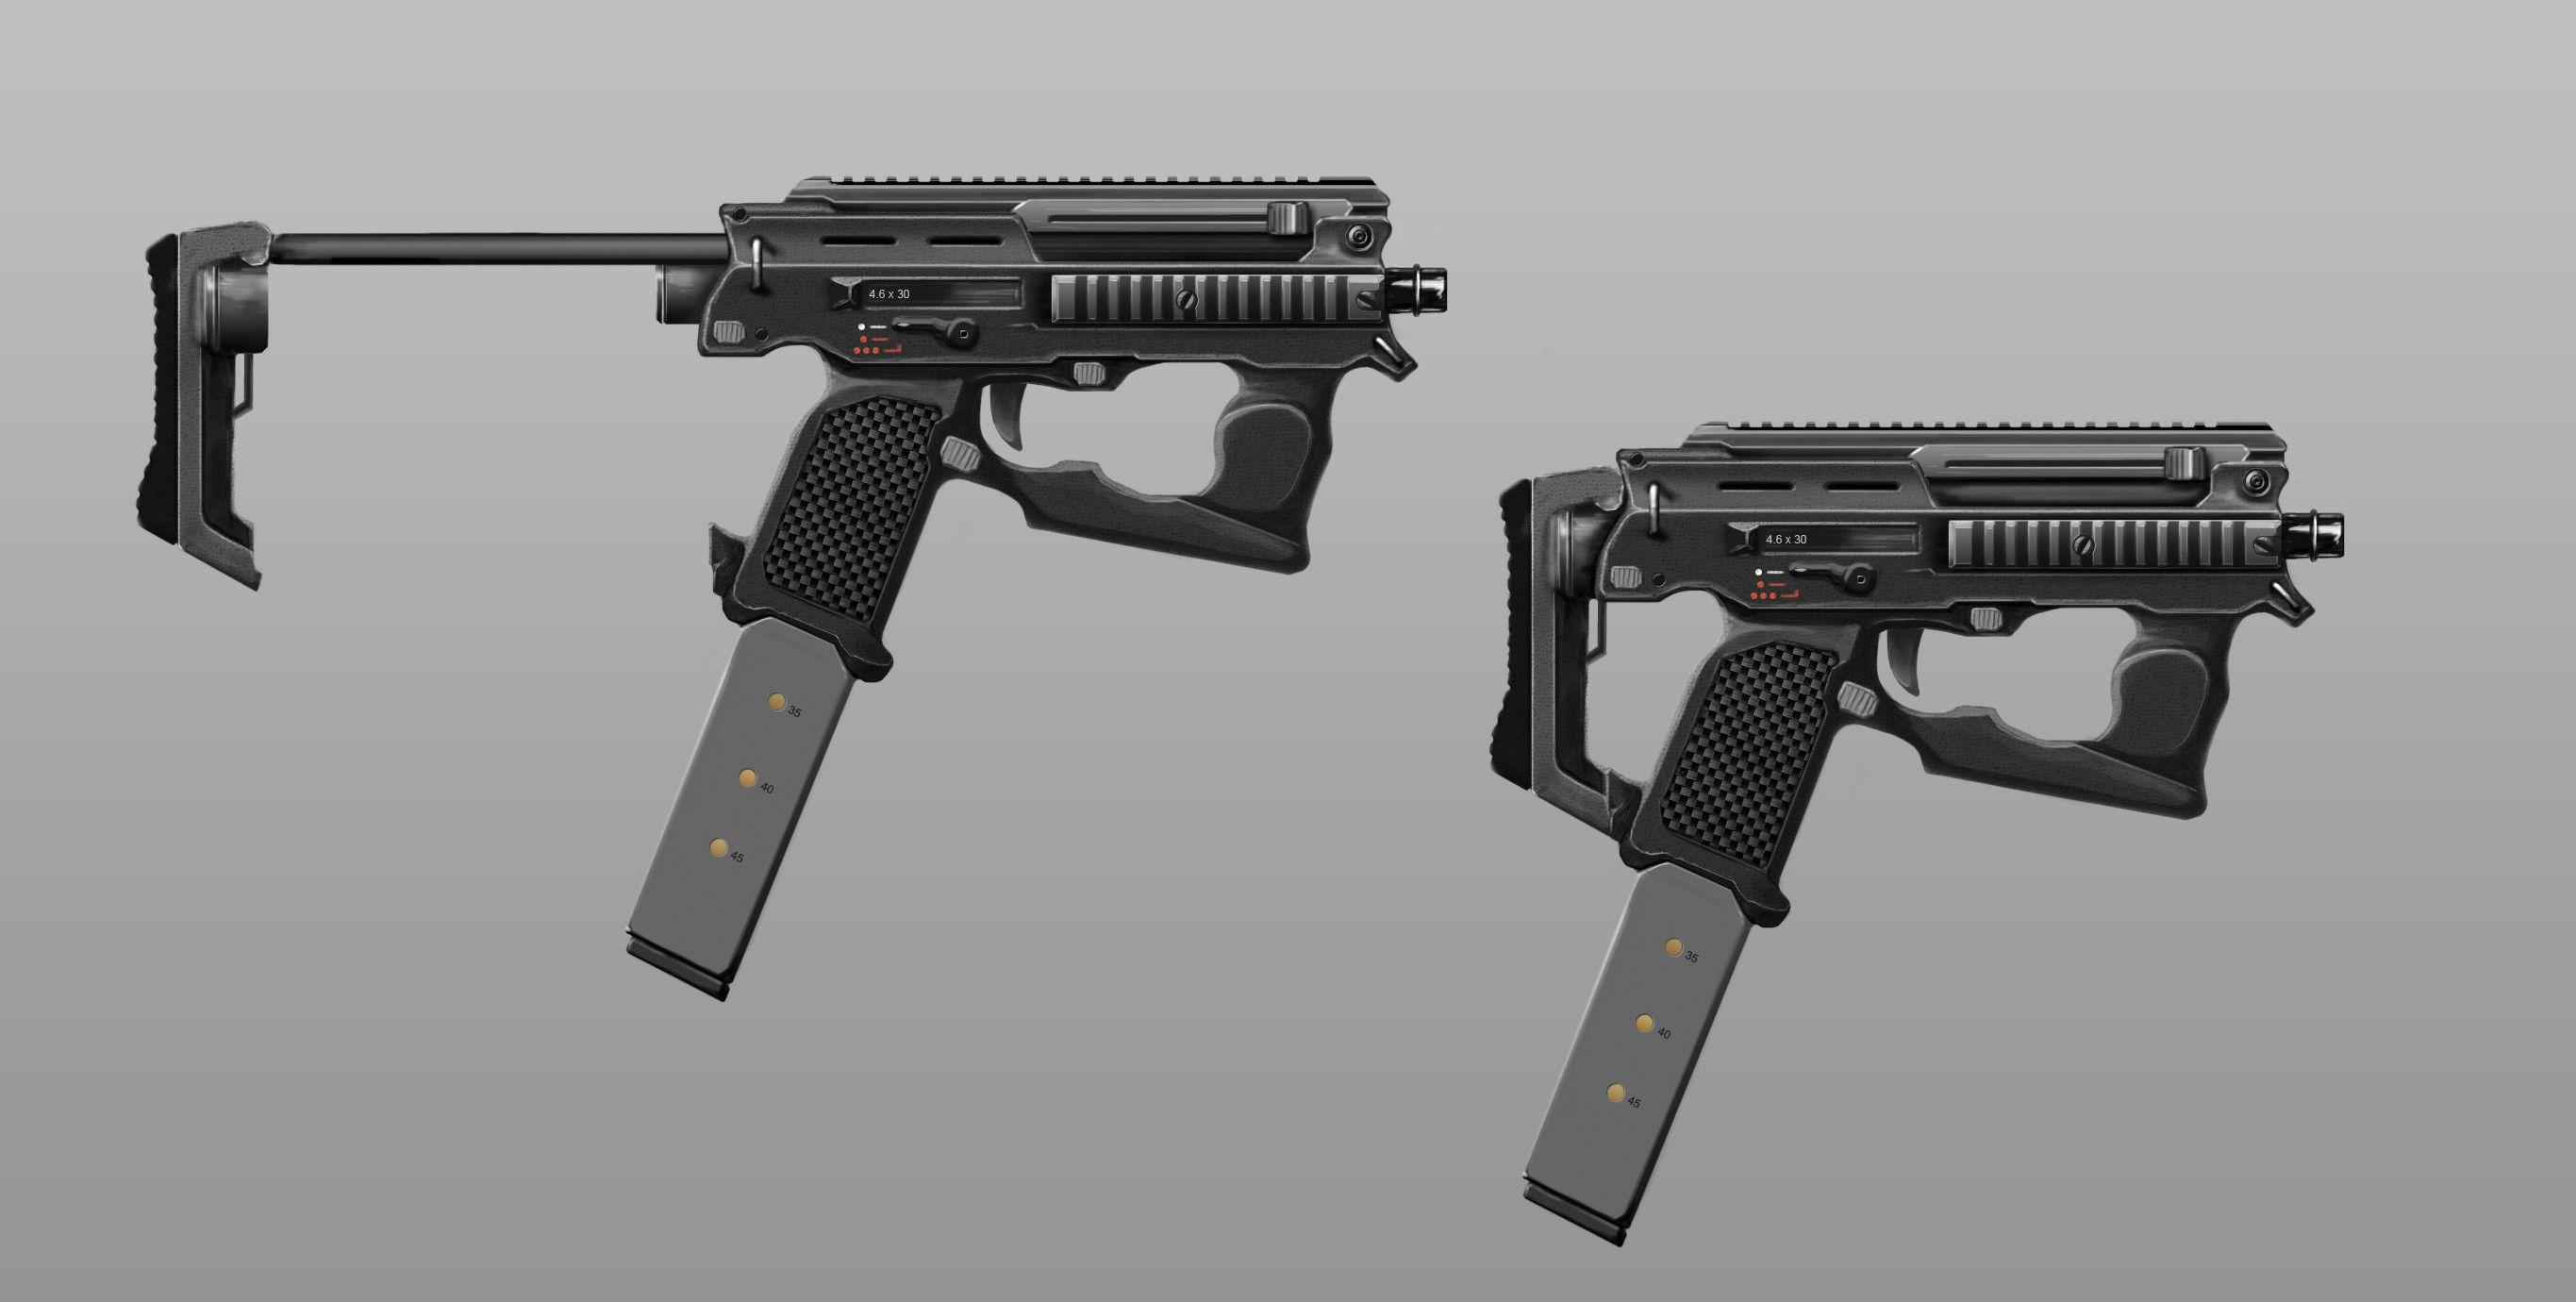 futuristic submachine guns - Google Search